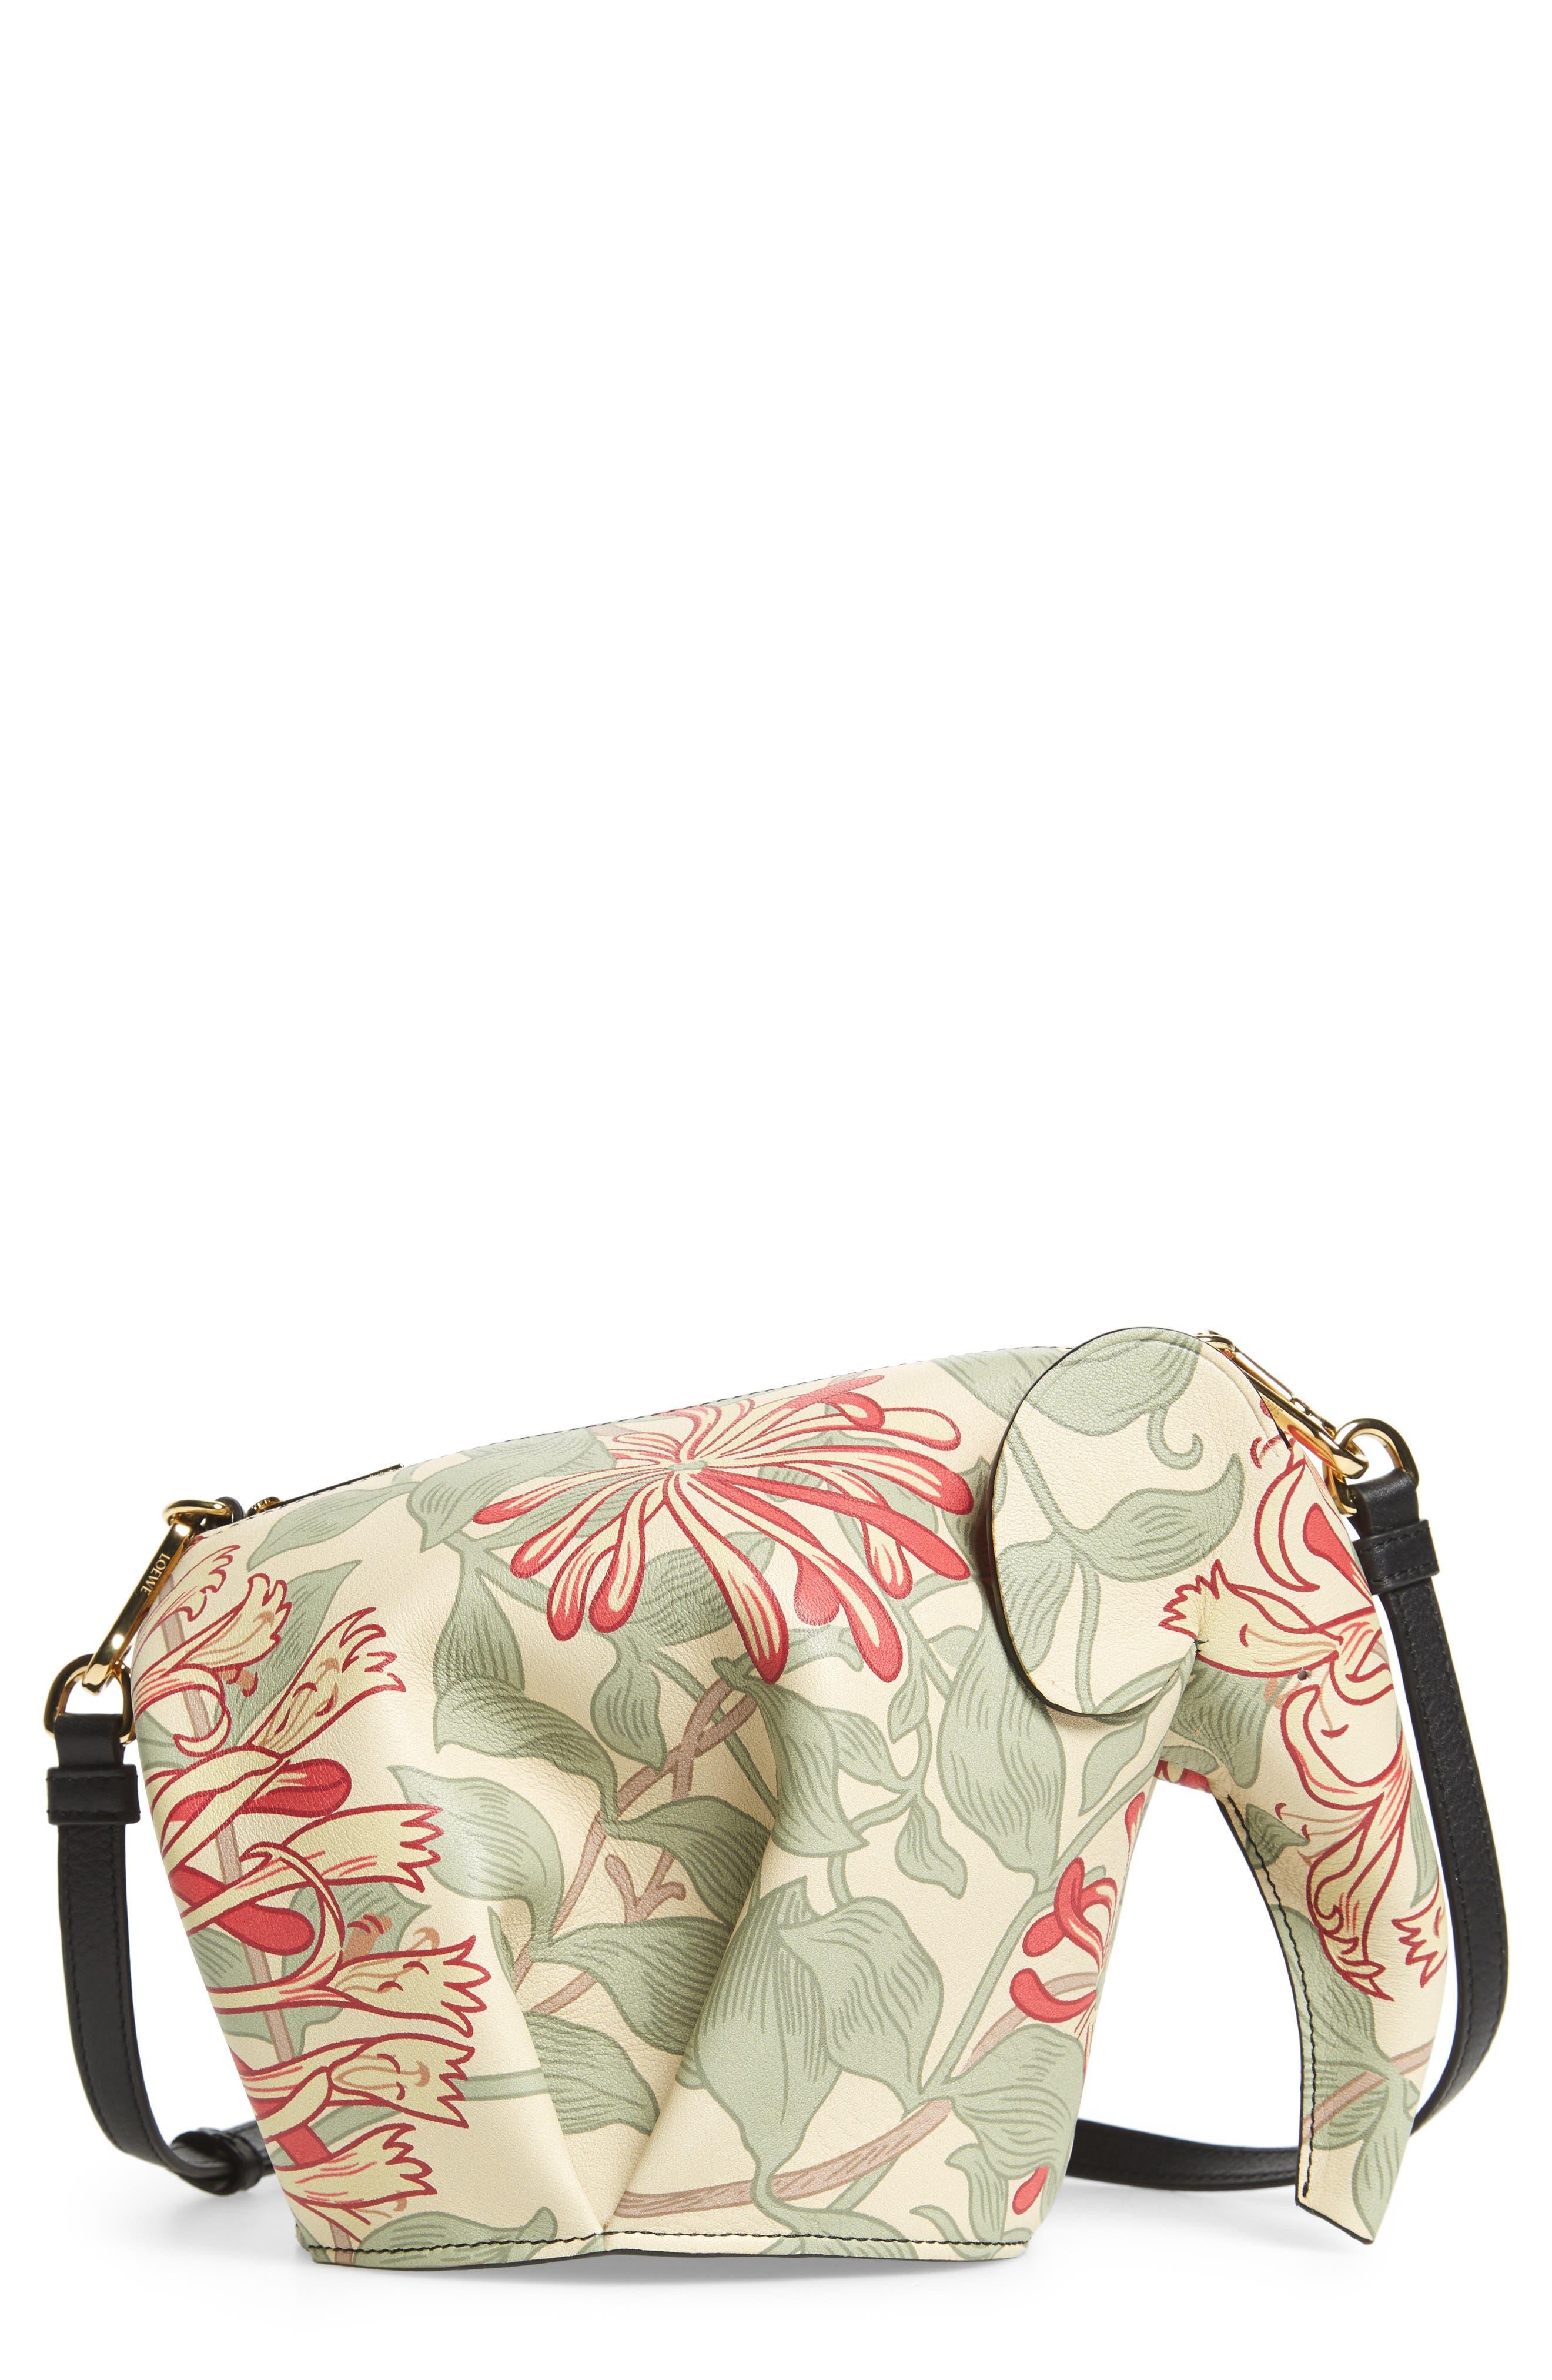 Mini Elephant Honeysuckle Print Leather Crossbody Bag,                         Main,                         color, Beige/ Green/ Multicolour